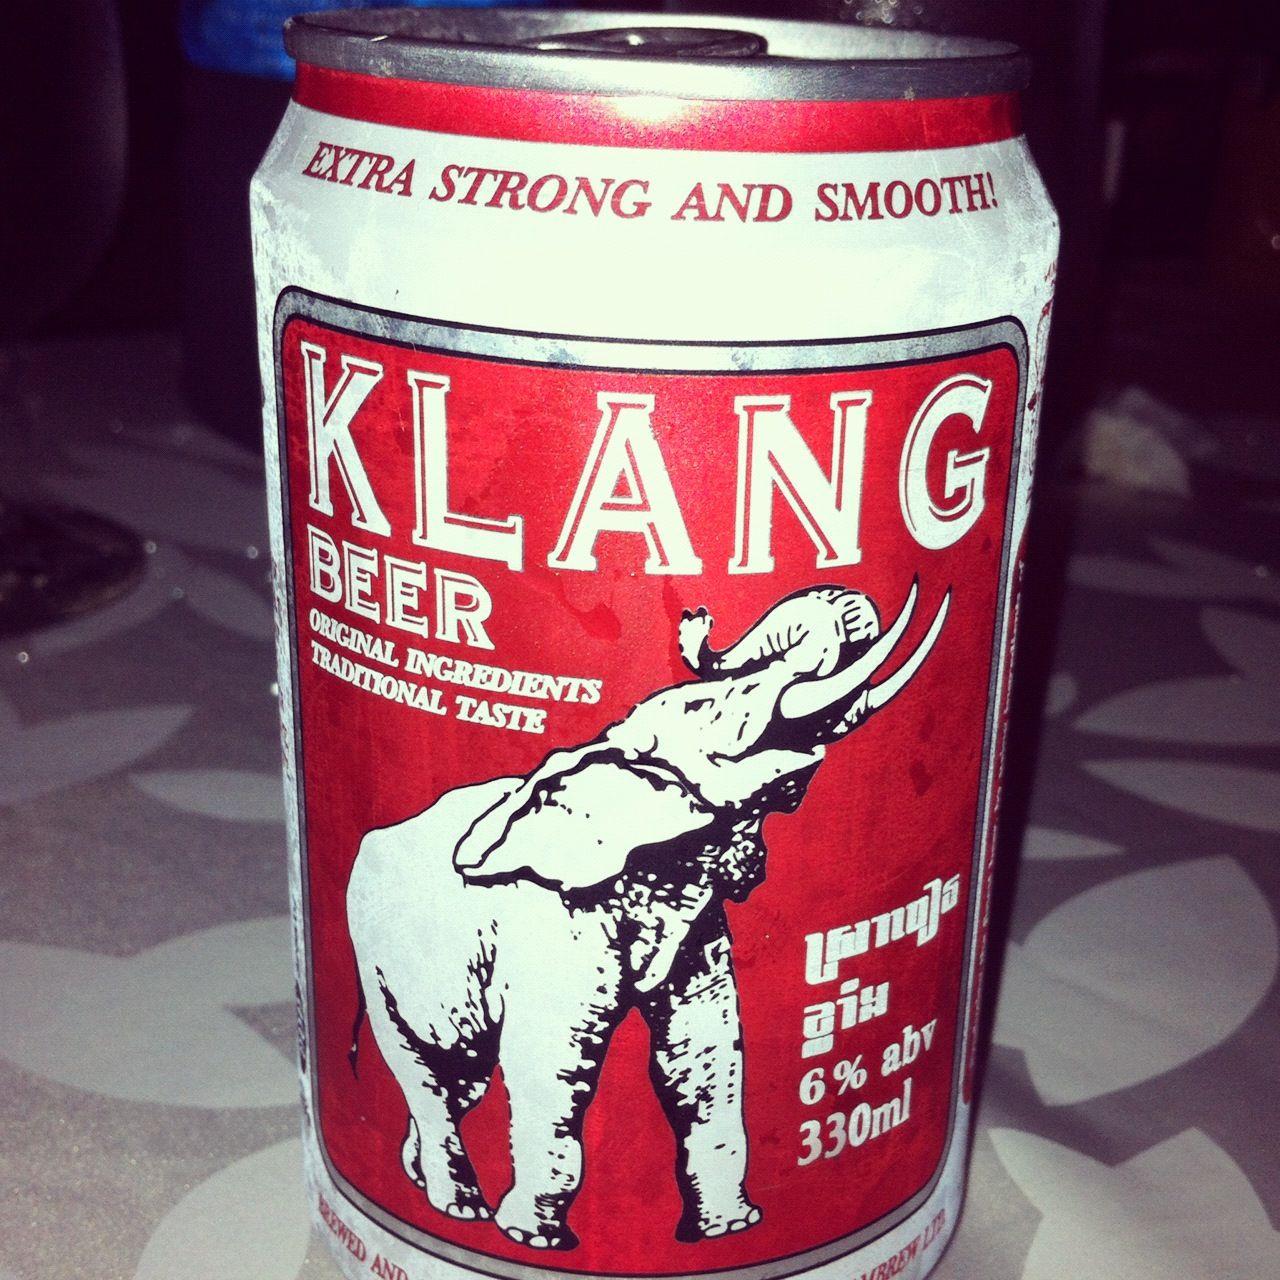 Klang Beer From Cambodia Klang Strong Beer Cerveja Traditional Taste Beer